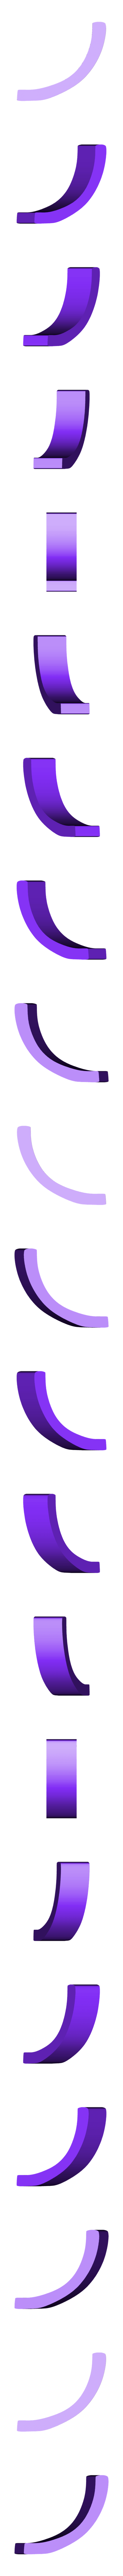 White3.stl Download free STL file Chicago Bulls Phone Stand • 3D printable design, stensethjeremy